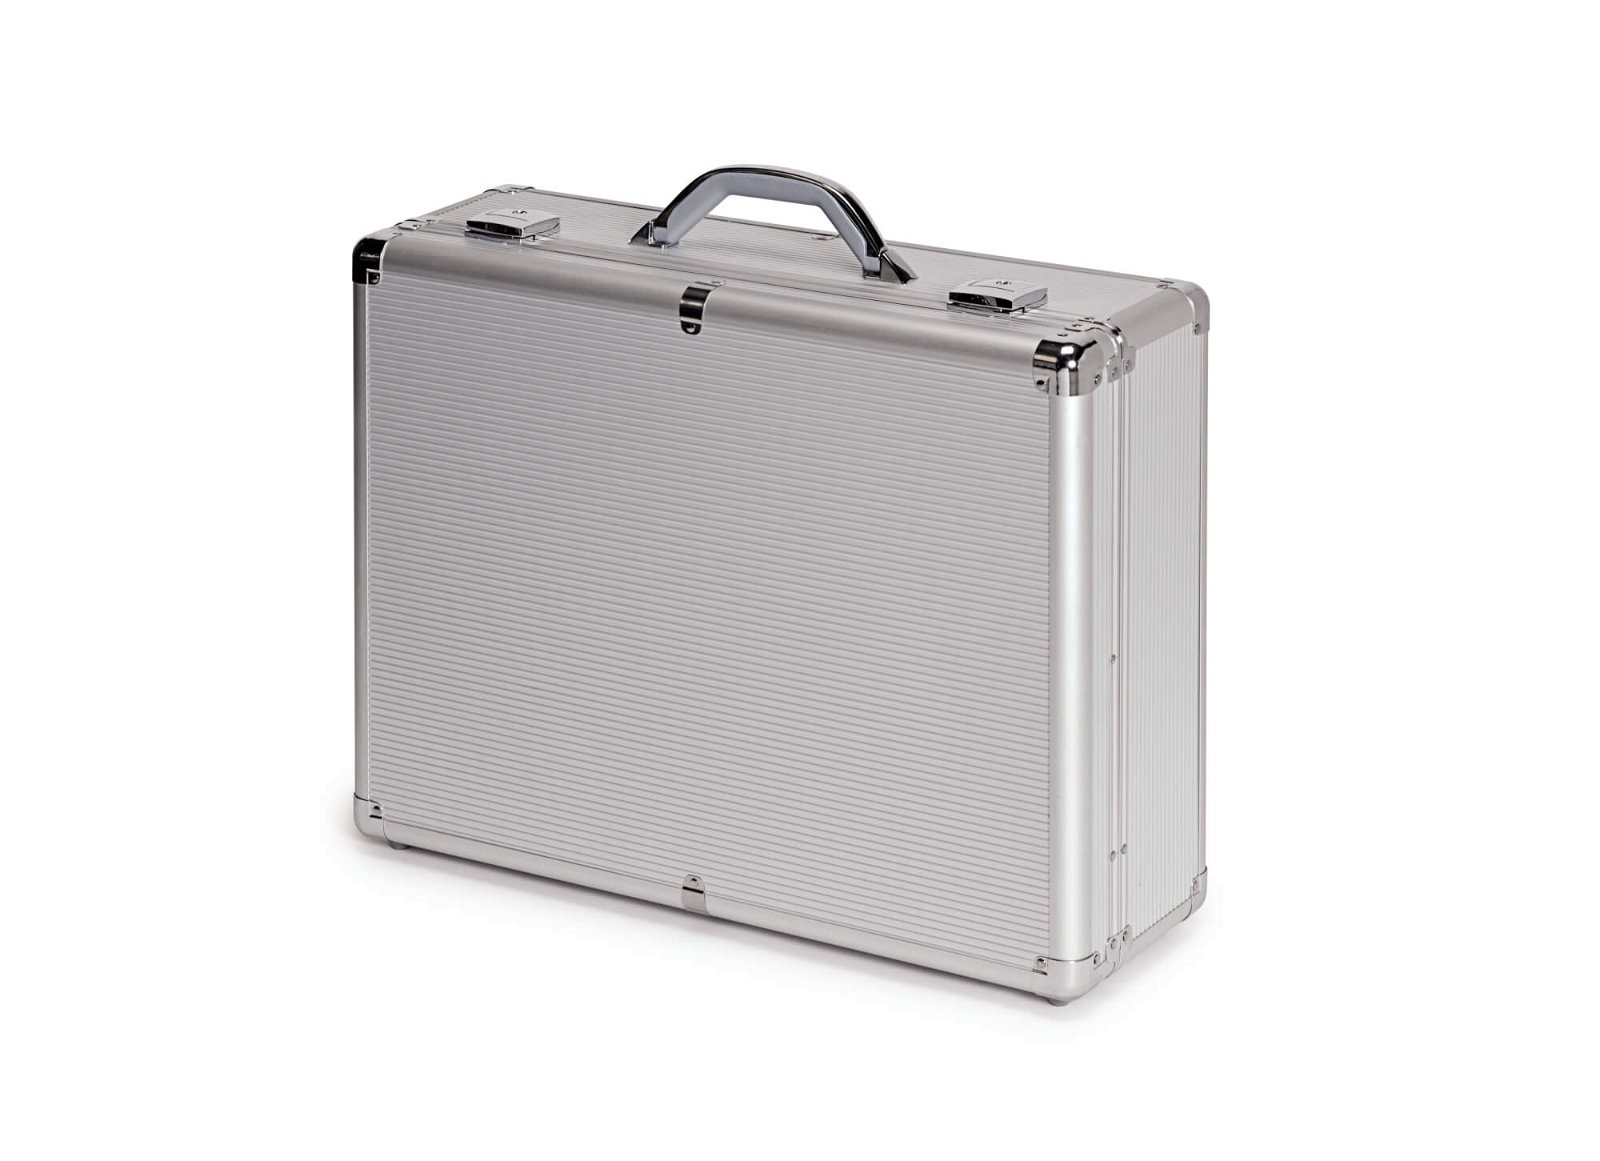 Moderatorenkoffer, Aluminium, sonstige